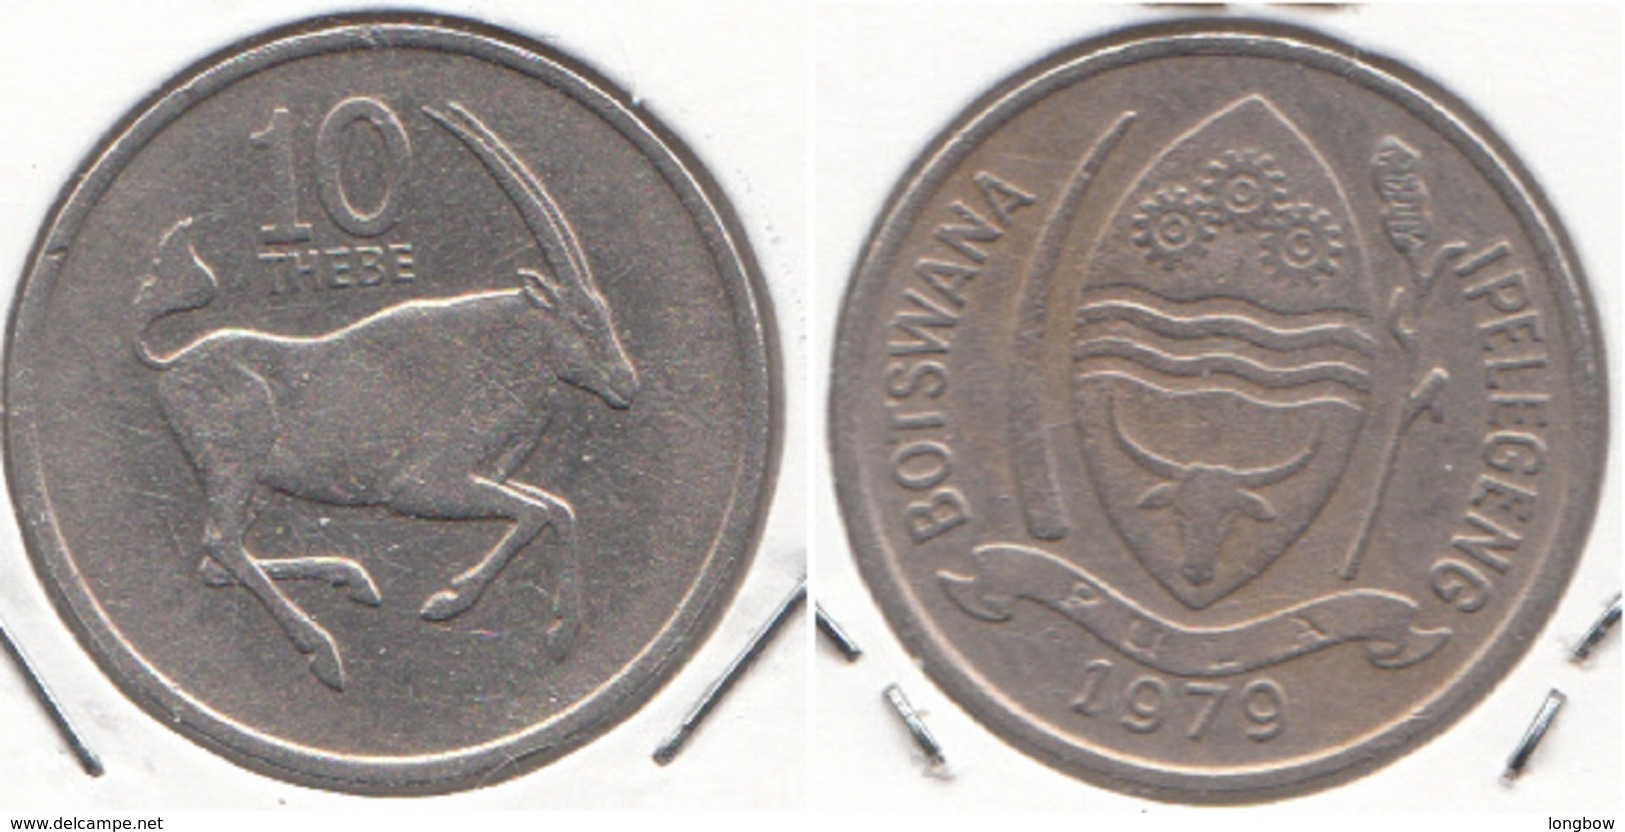 Botswana 10 Thebe 1979 KM#5 - Used - Botswana